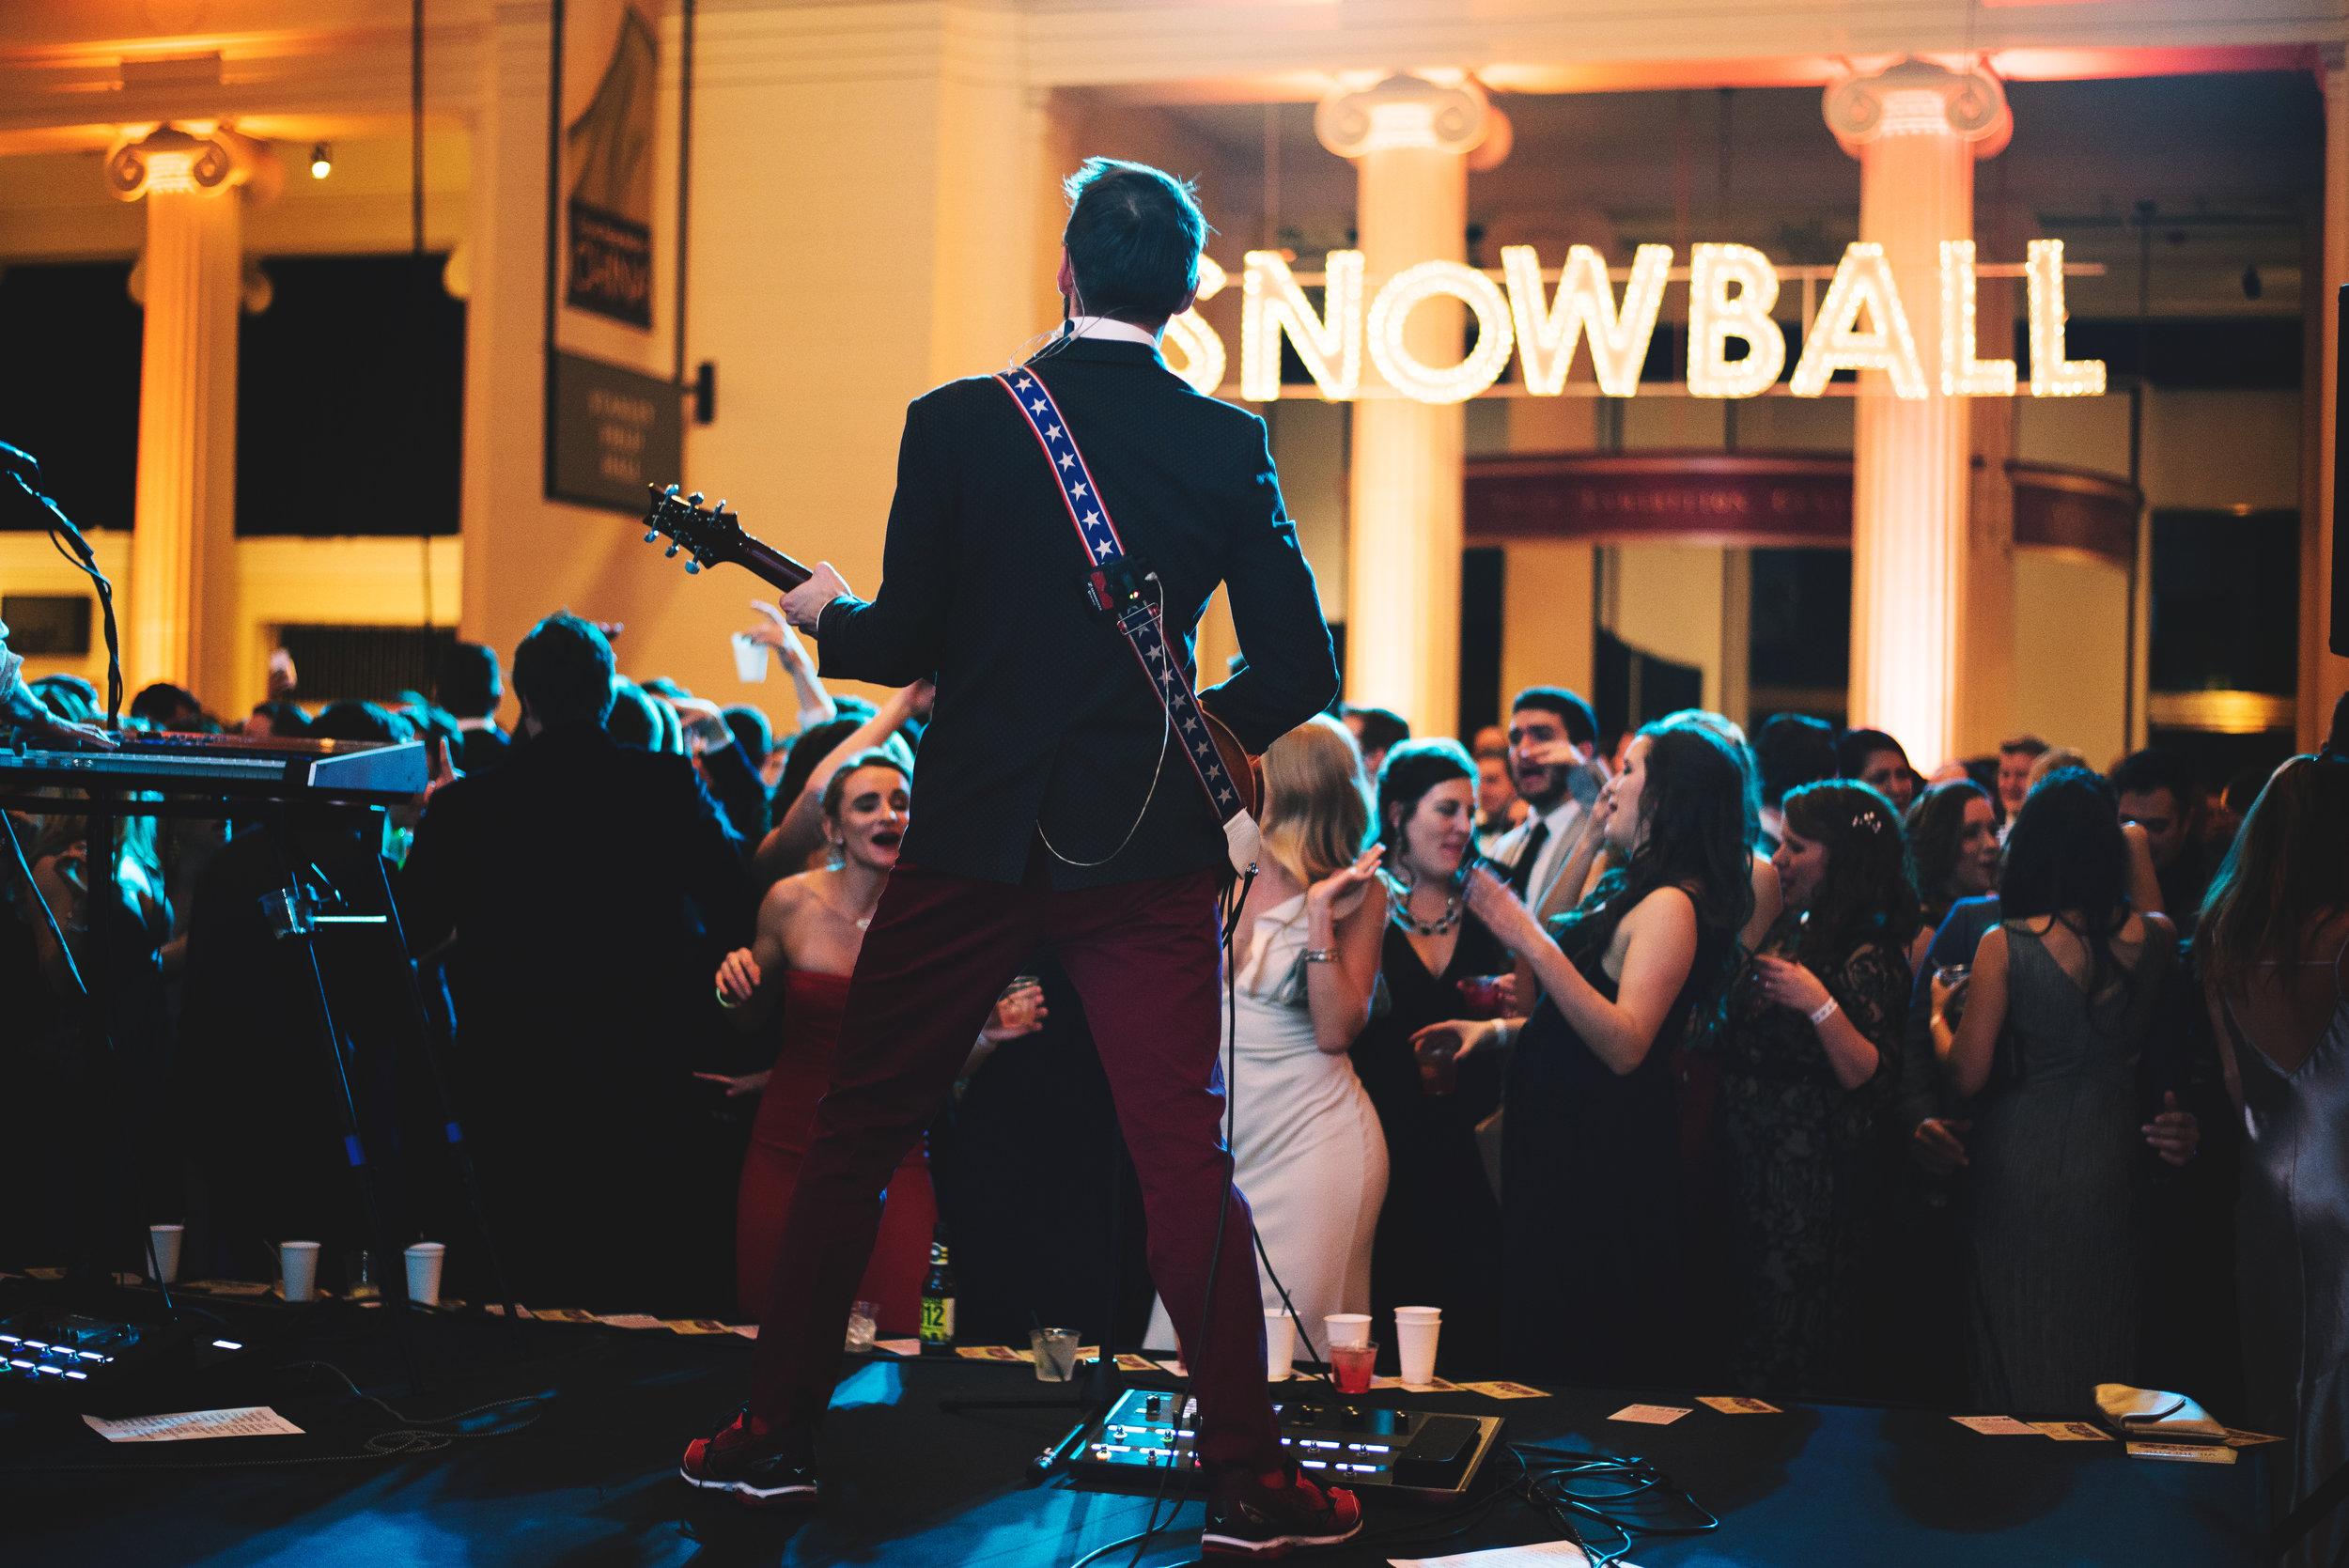 SnowBall-FieldMuseum-Chicago-Fundraiser066.jpg